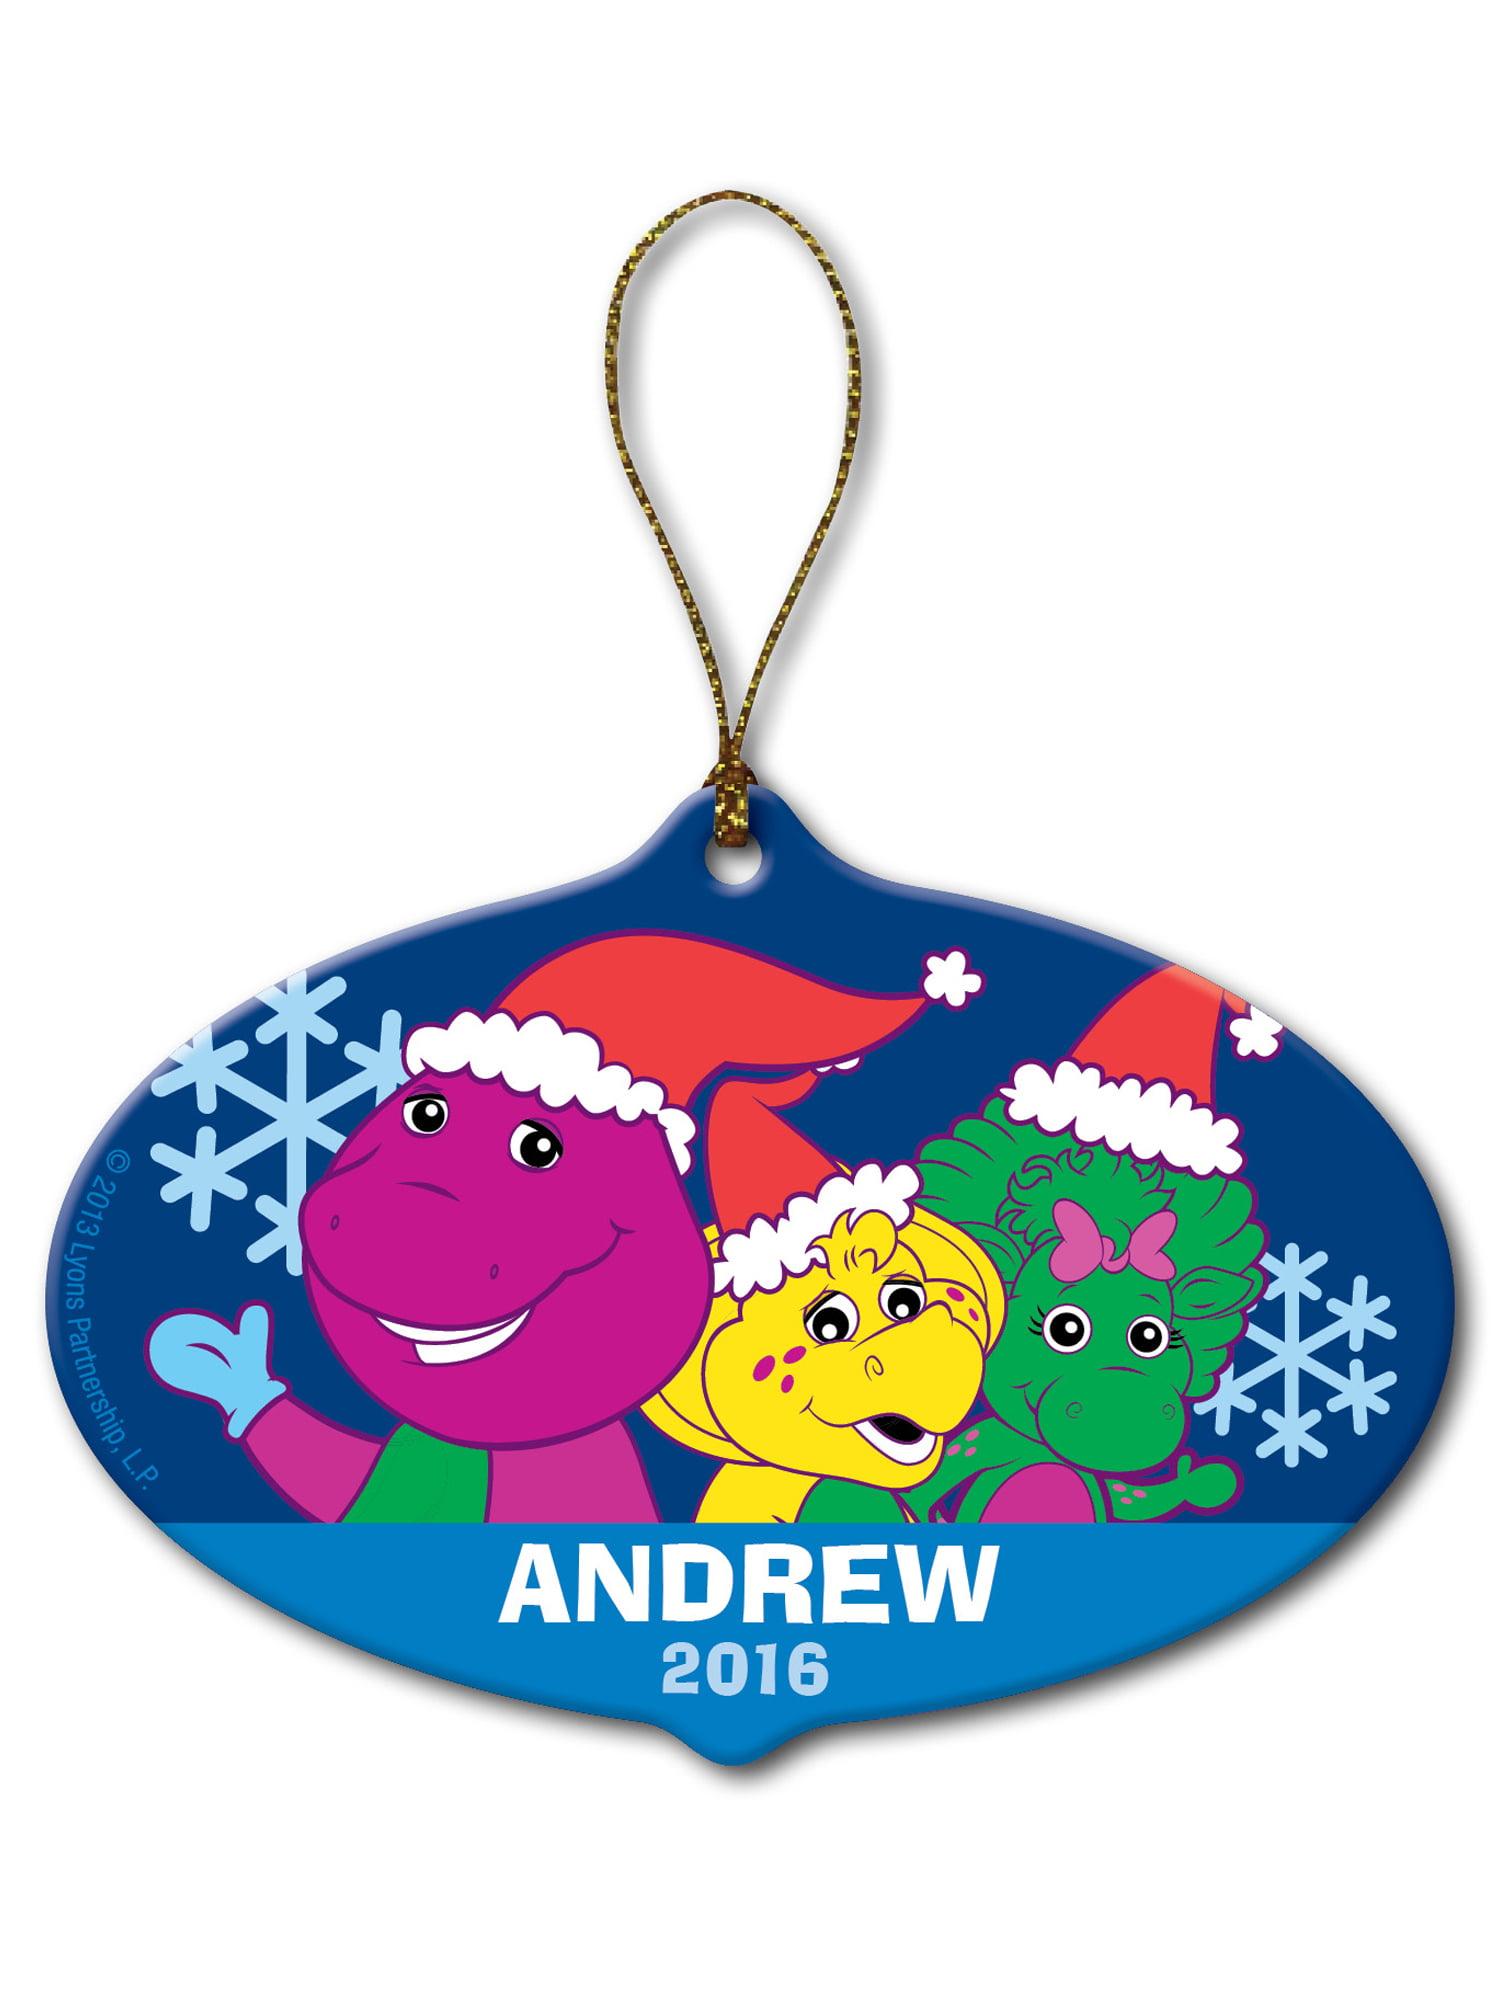 Personalized Barney & Friends Snowflake Christmas Ornament - Walmart.com